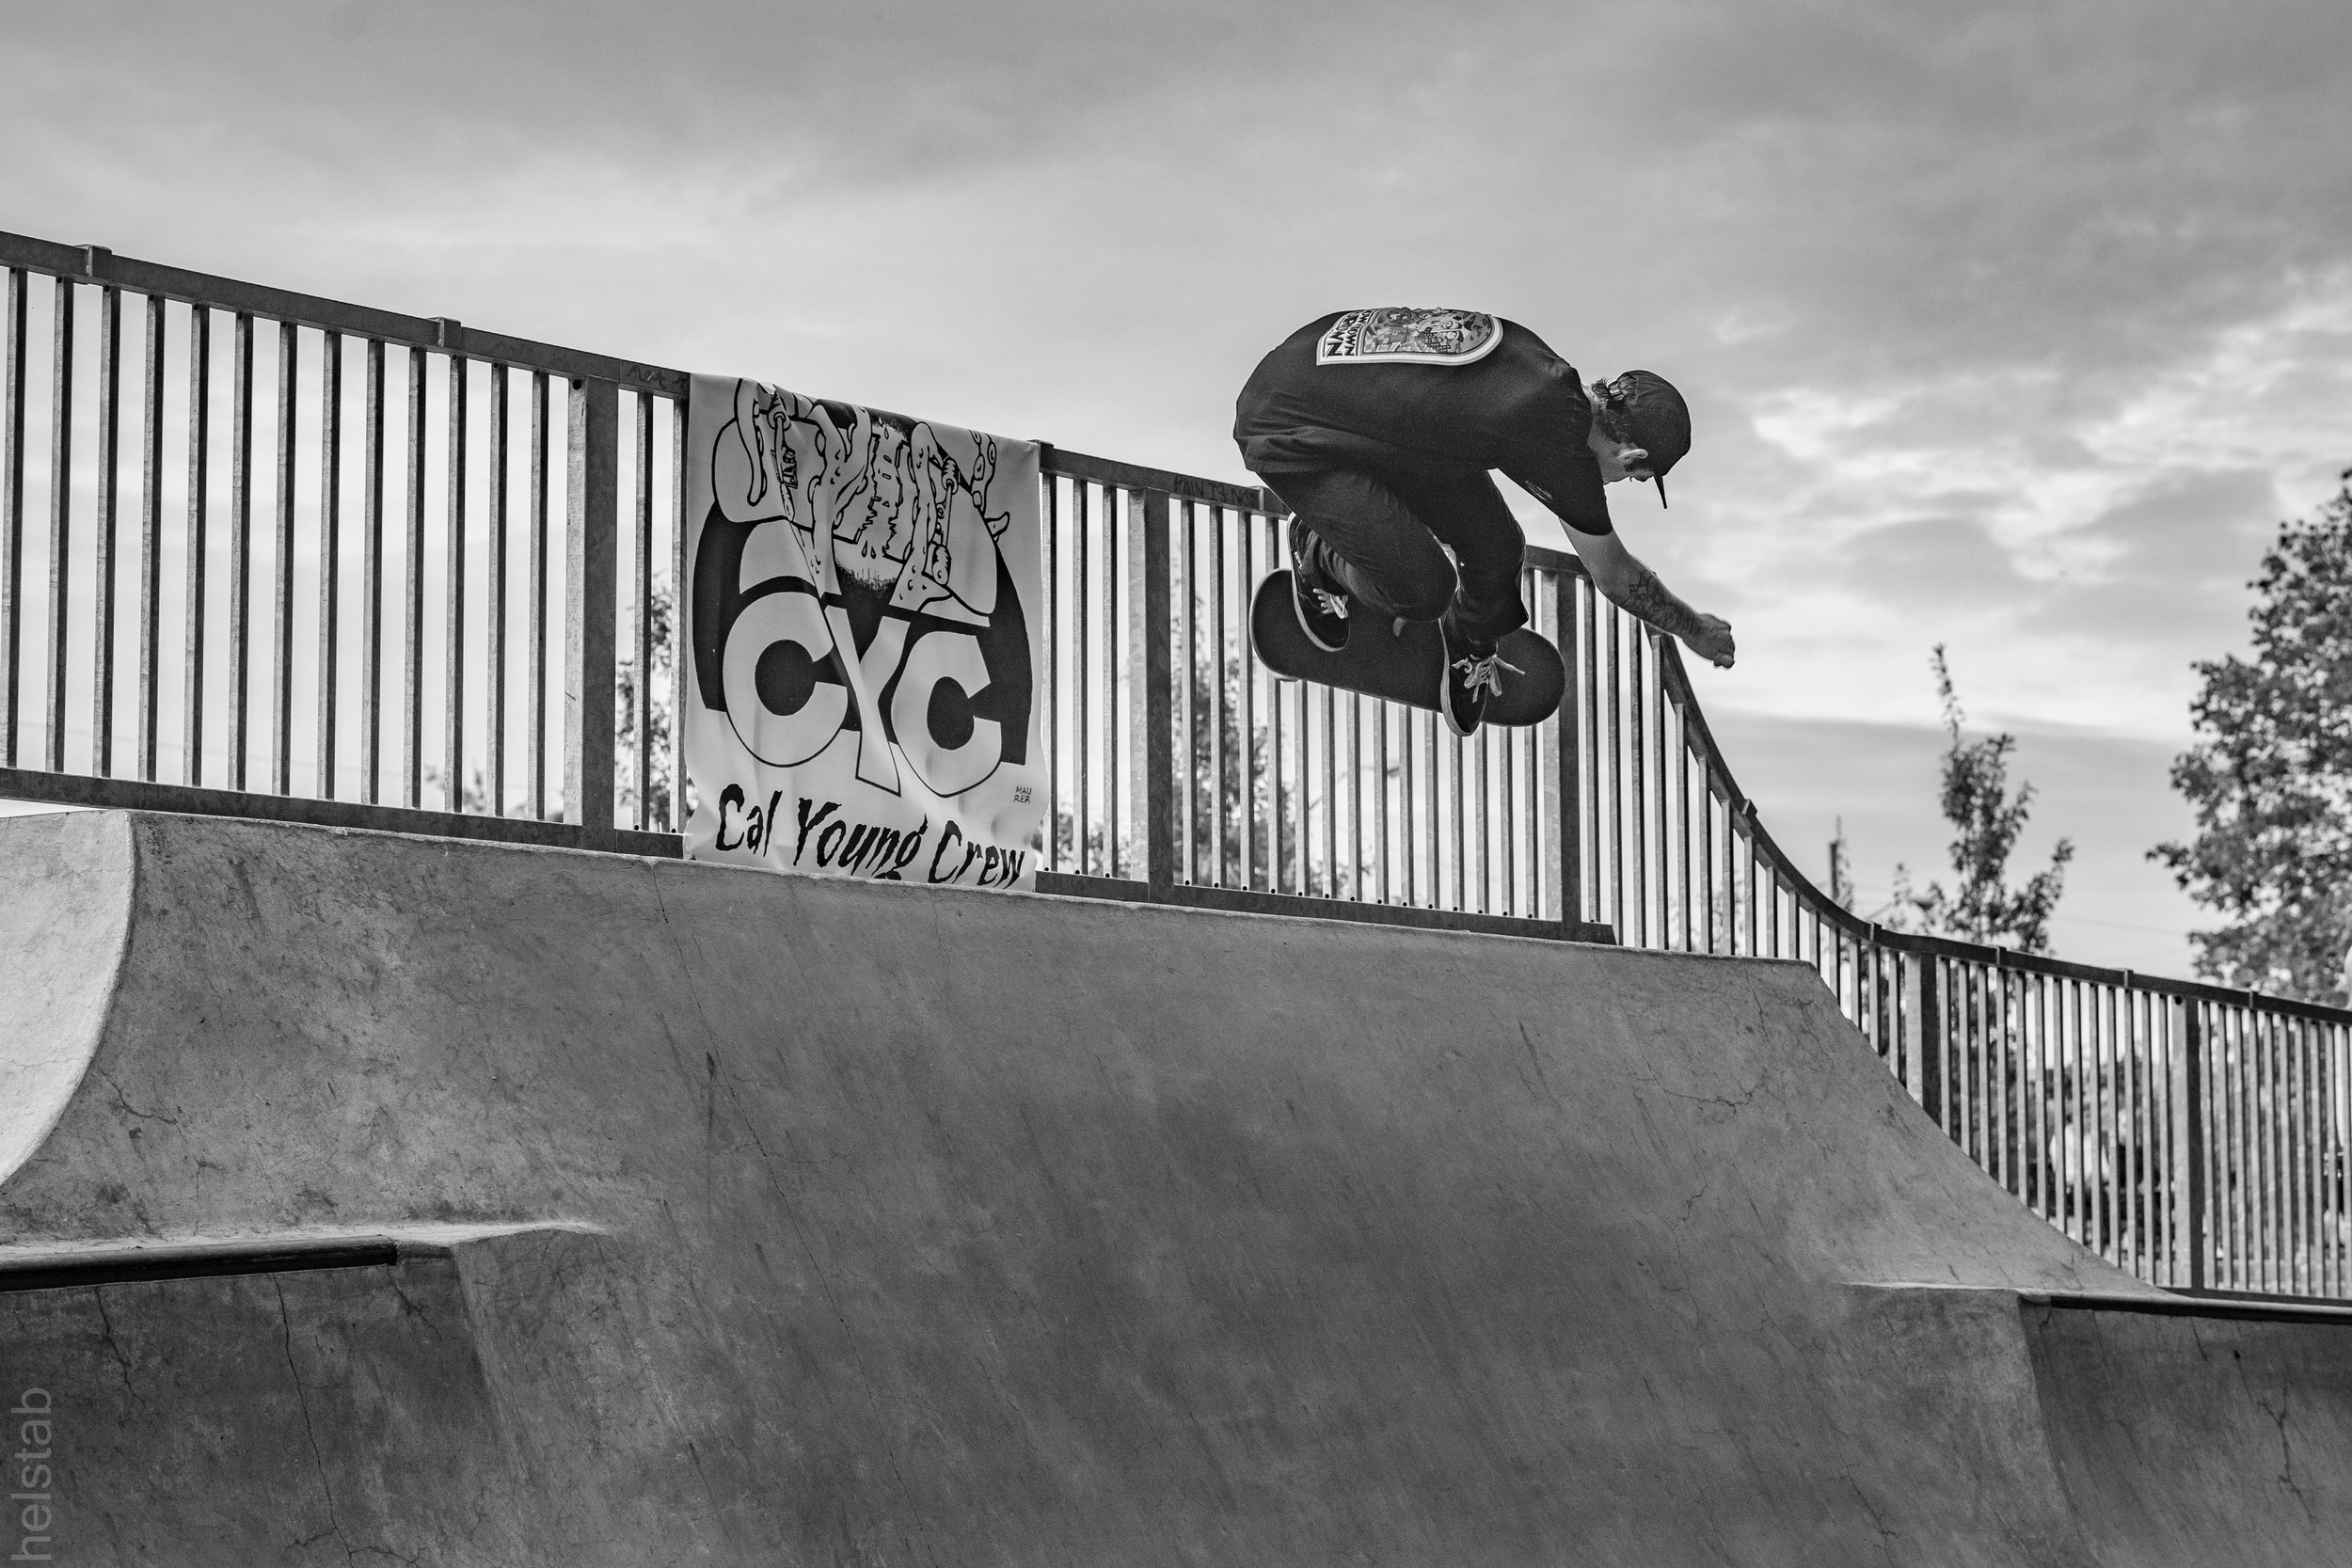 Colin Crespino - Bs Melon - Photo. Matt Helstab